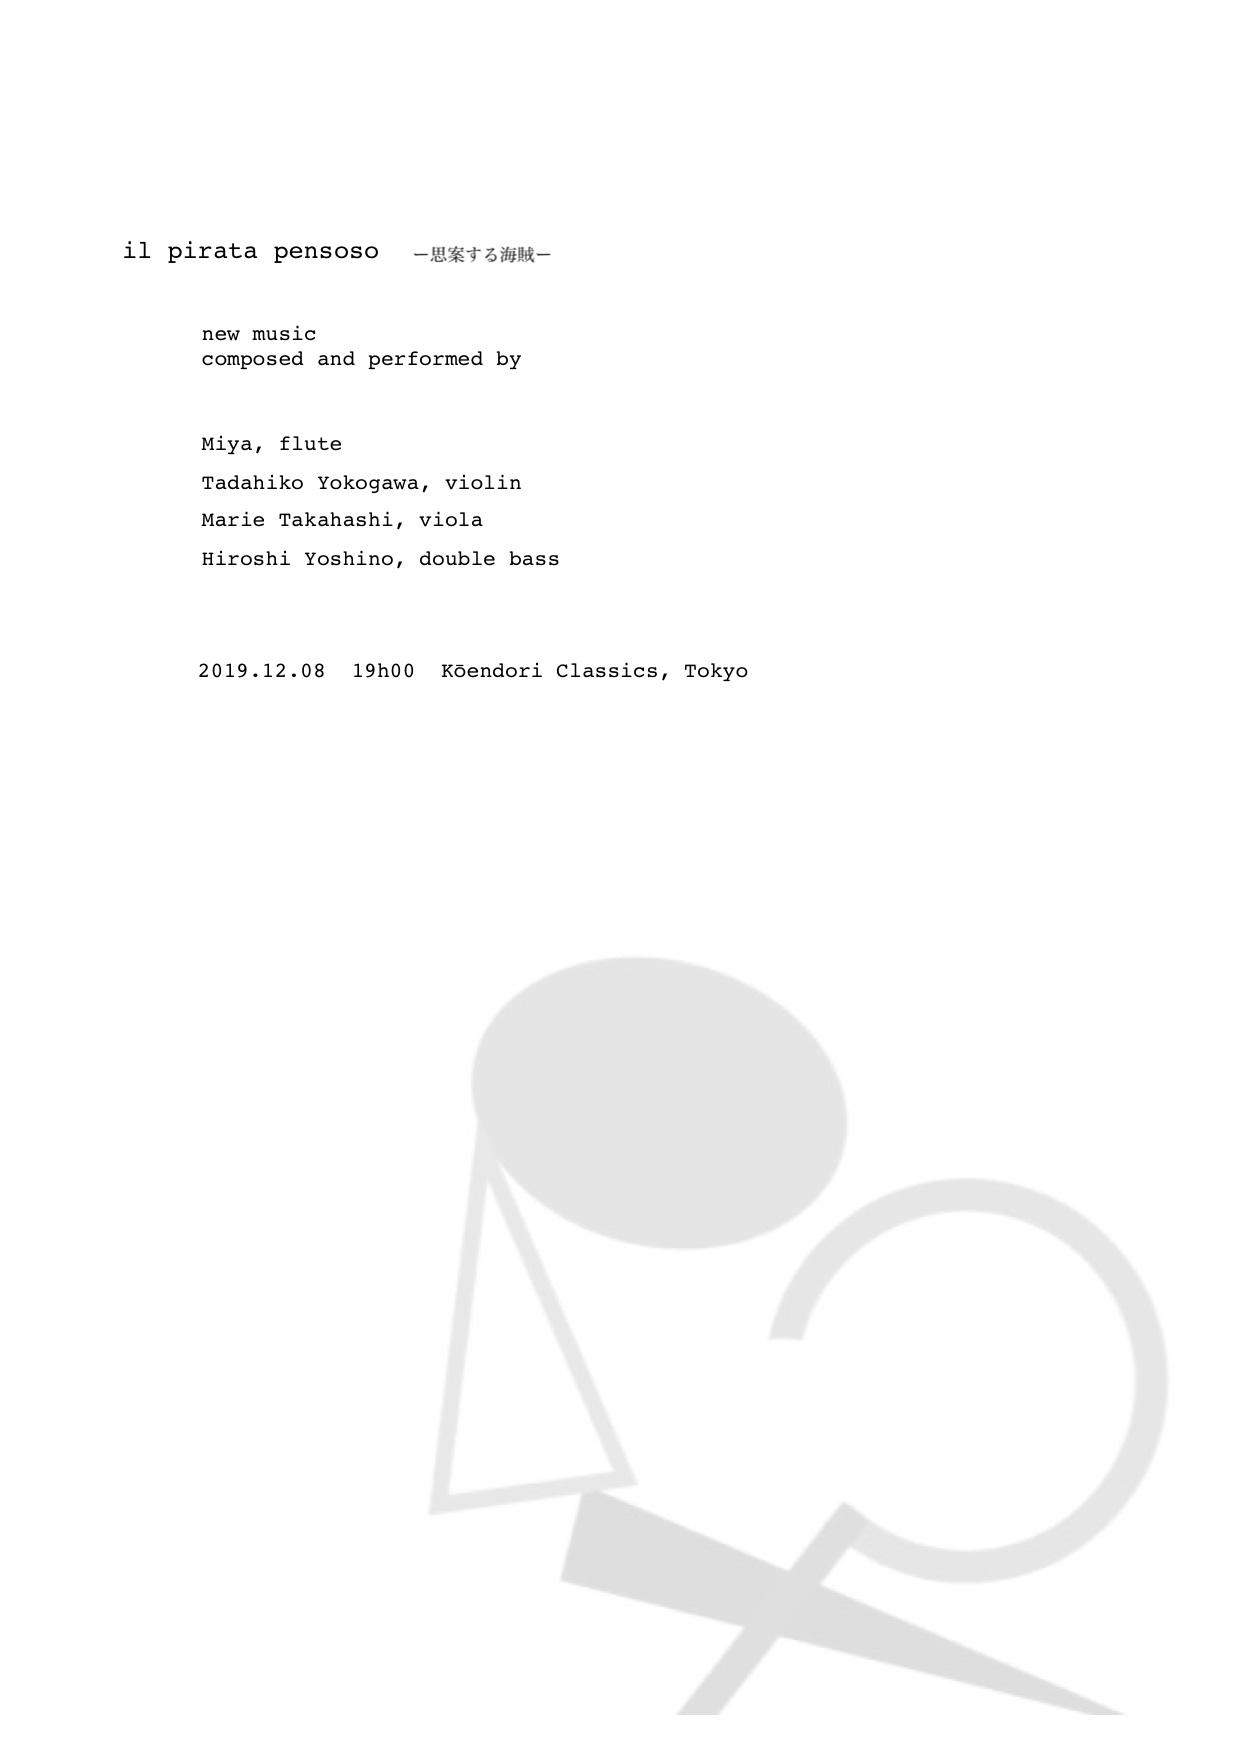 """ il pirata pensoso"" イル ピラータ ペンソーゾ (思案する海賊)Marie Takahashi ・ Miya ・ 横川理彦・吉野弘志"